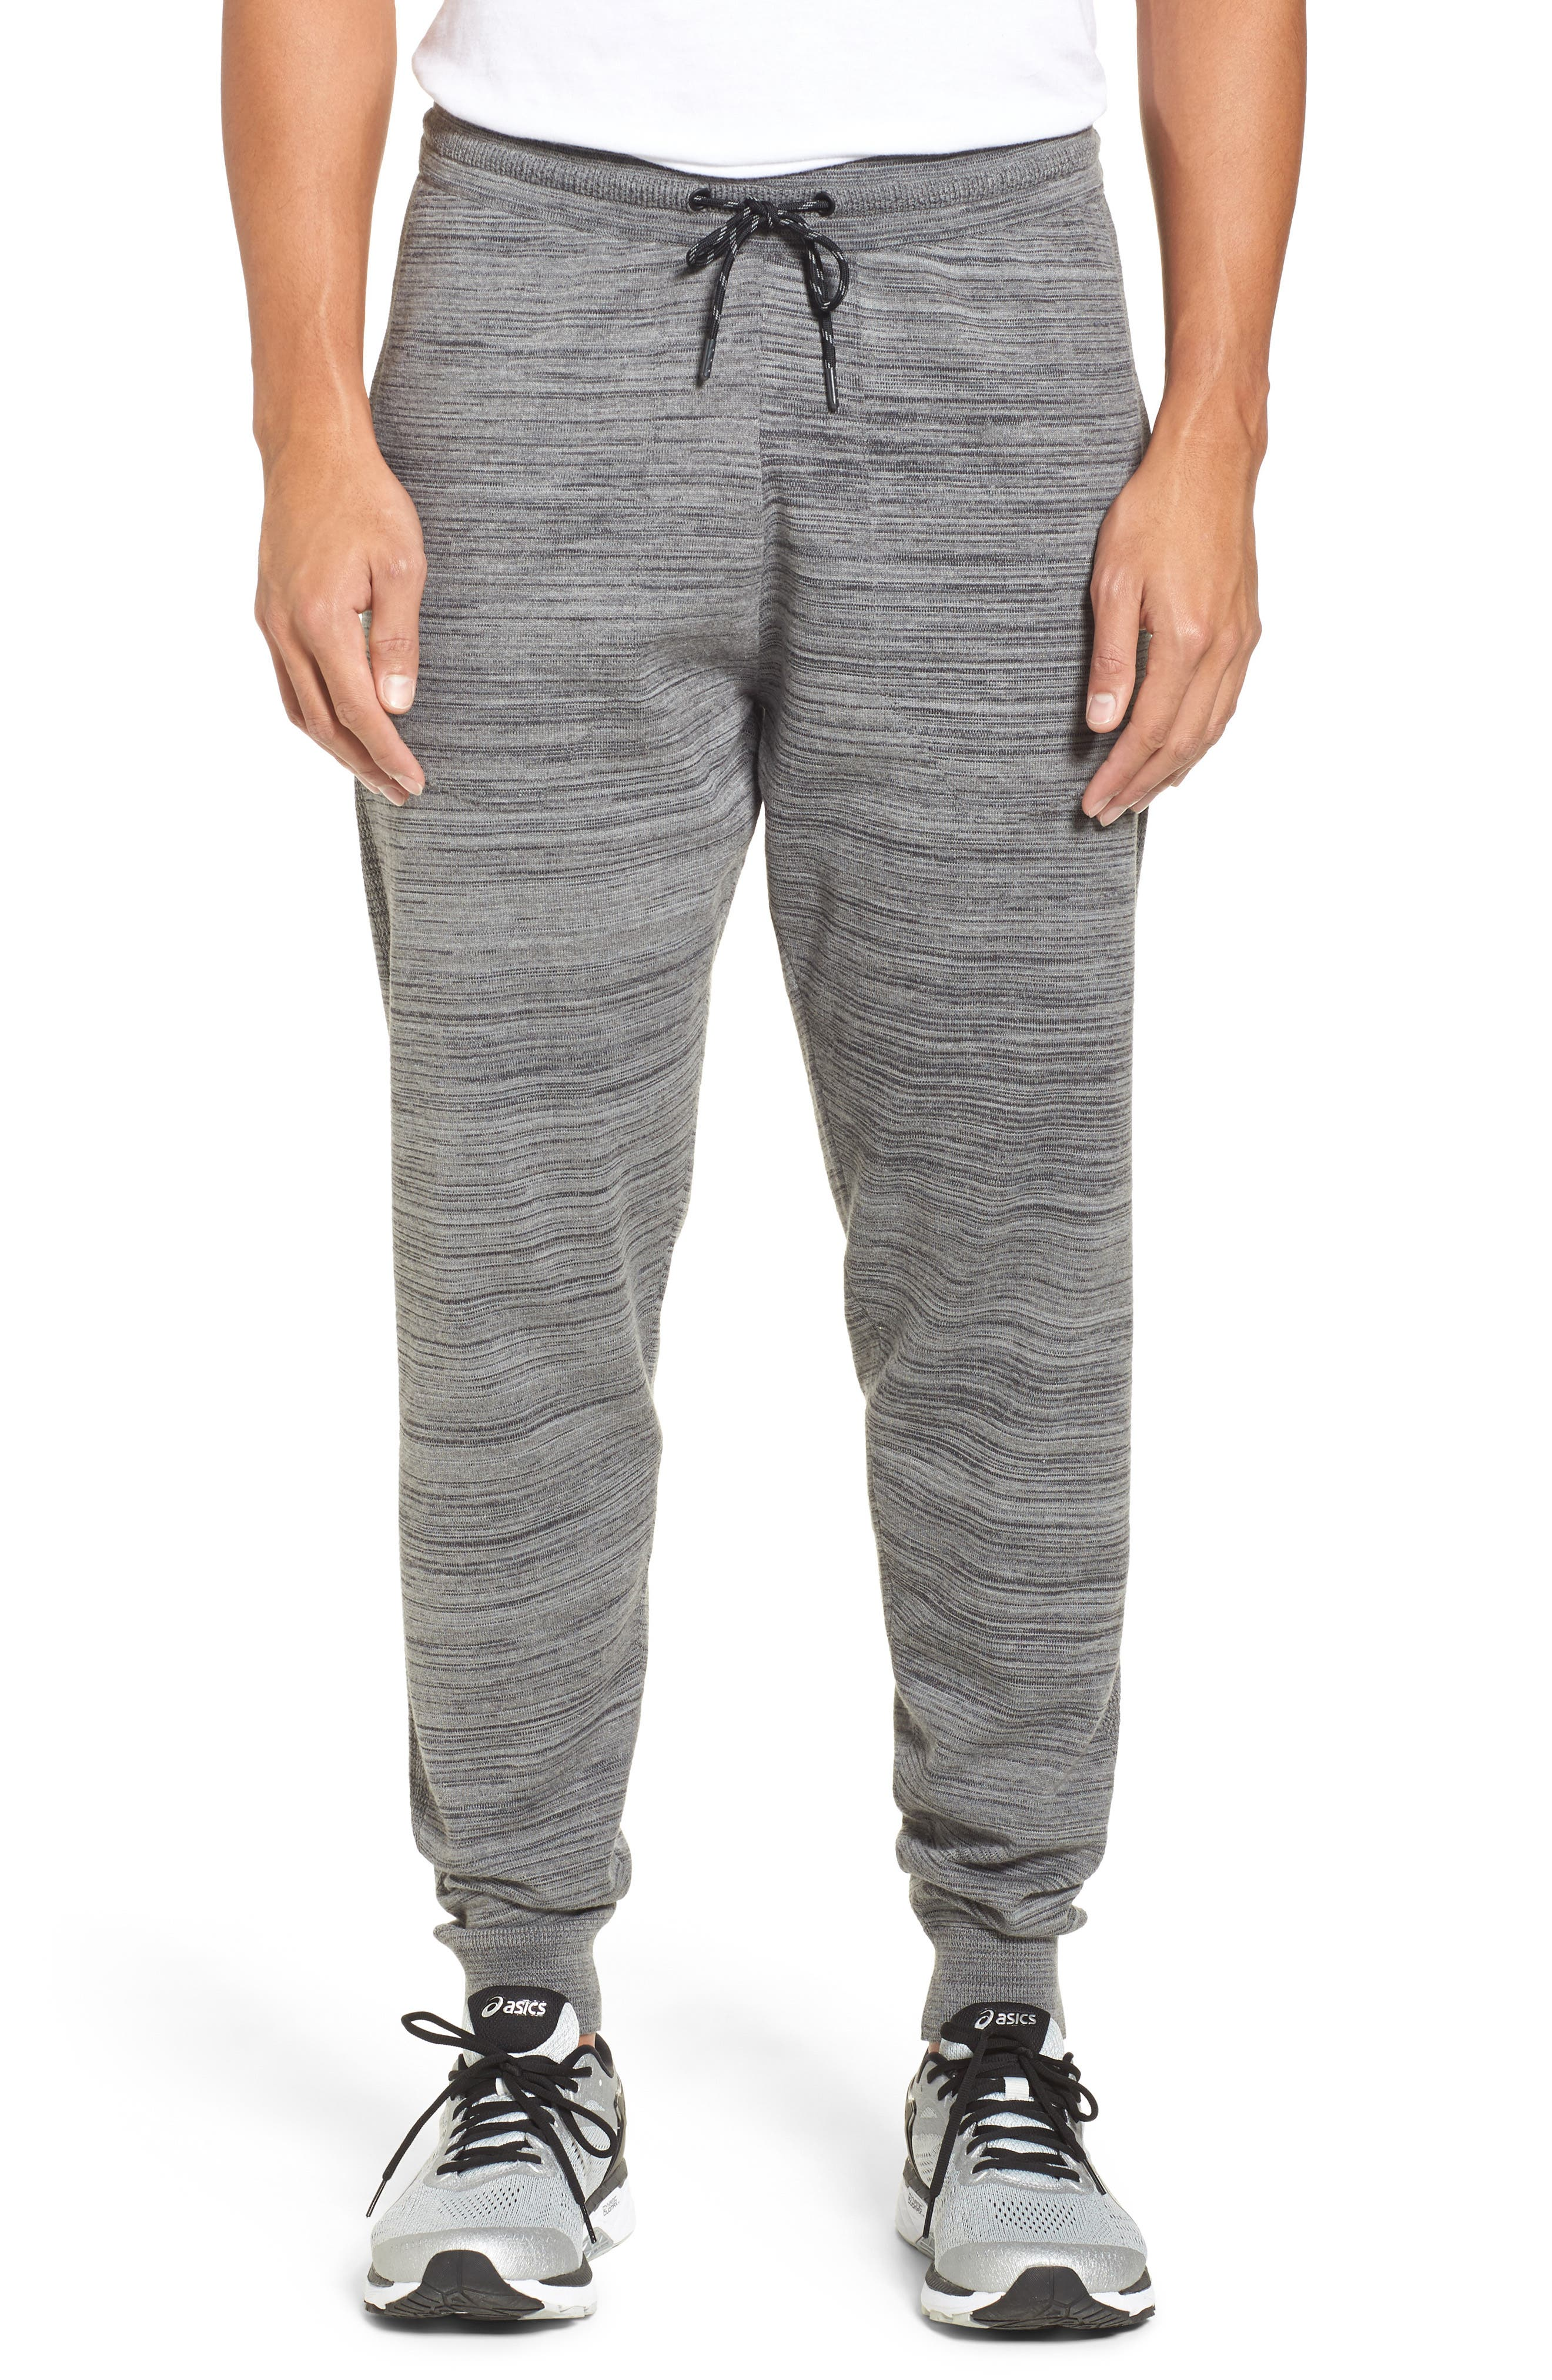 Tech Sweater Knit Jogger Pants,                         Main,                         color, Grey Obsidian Spacedye